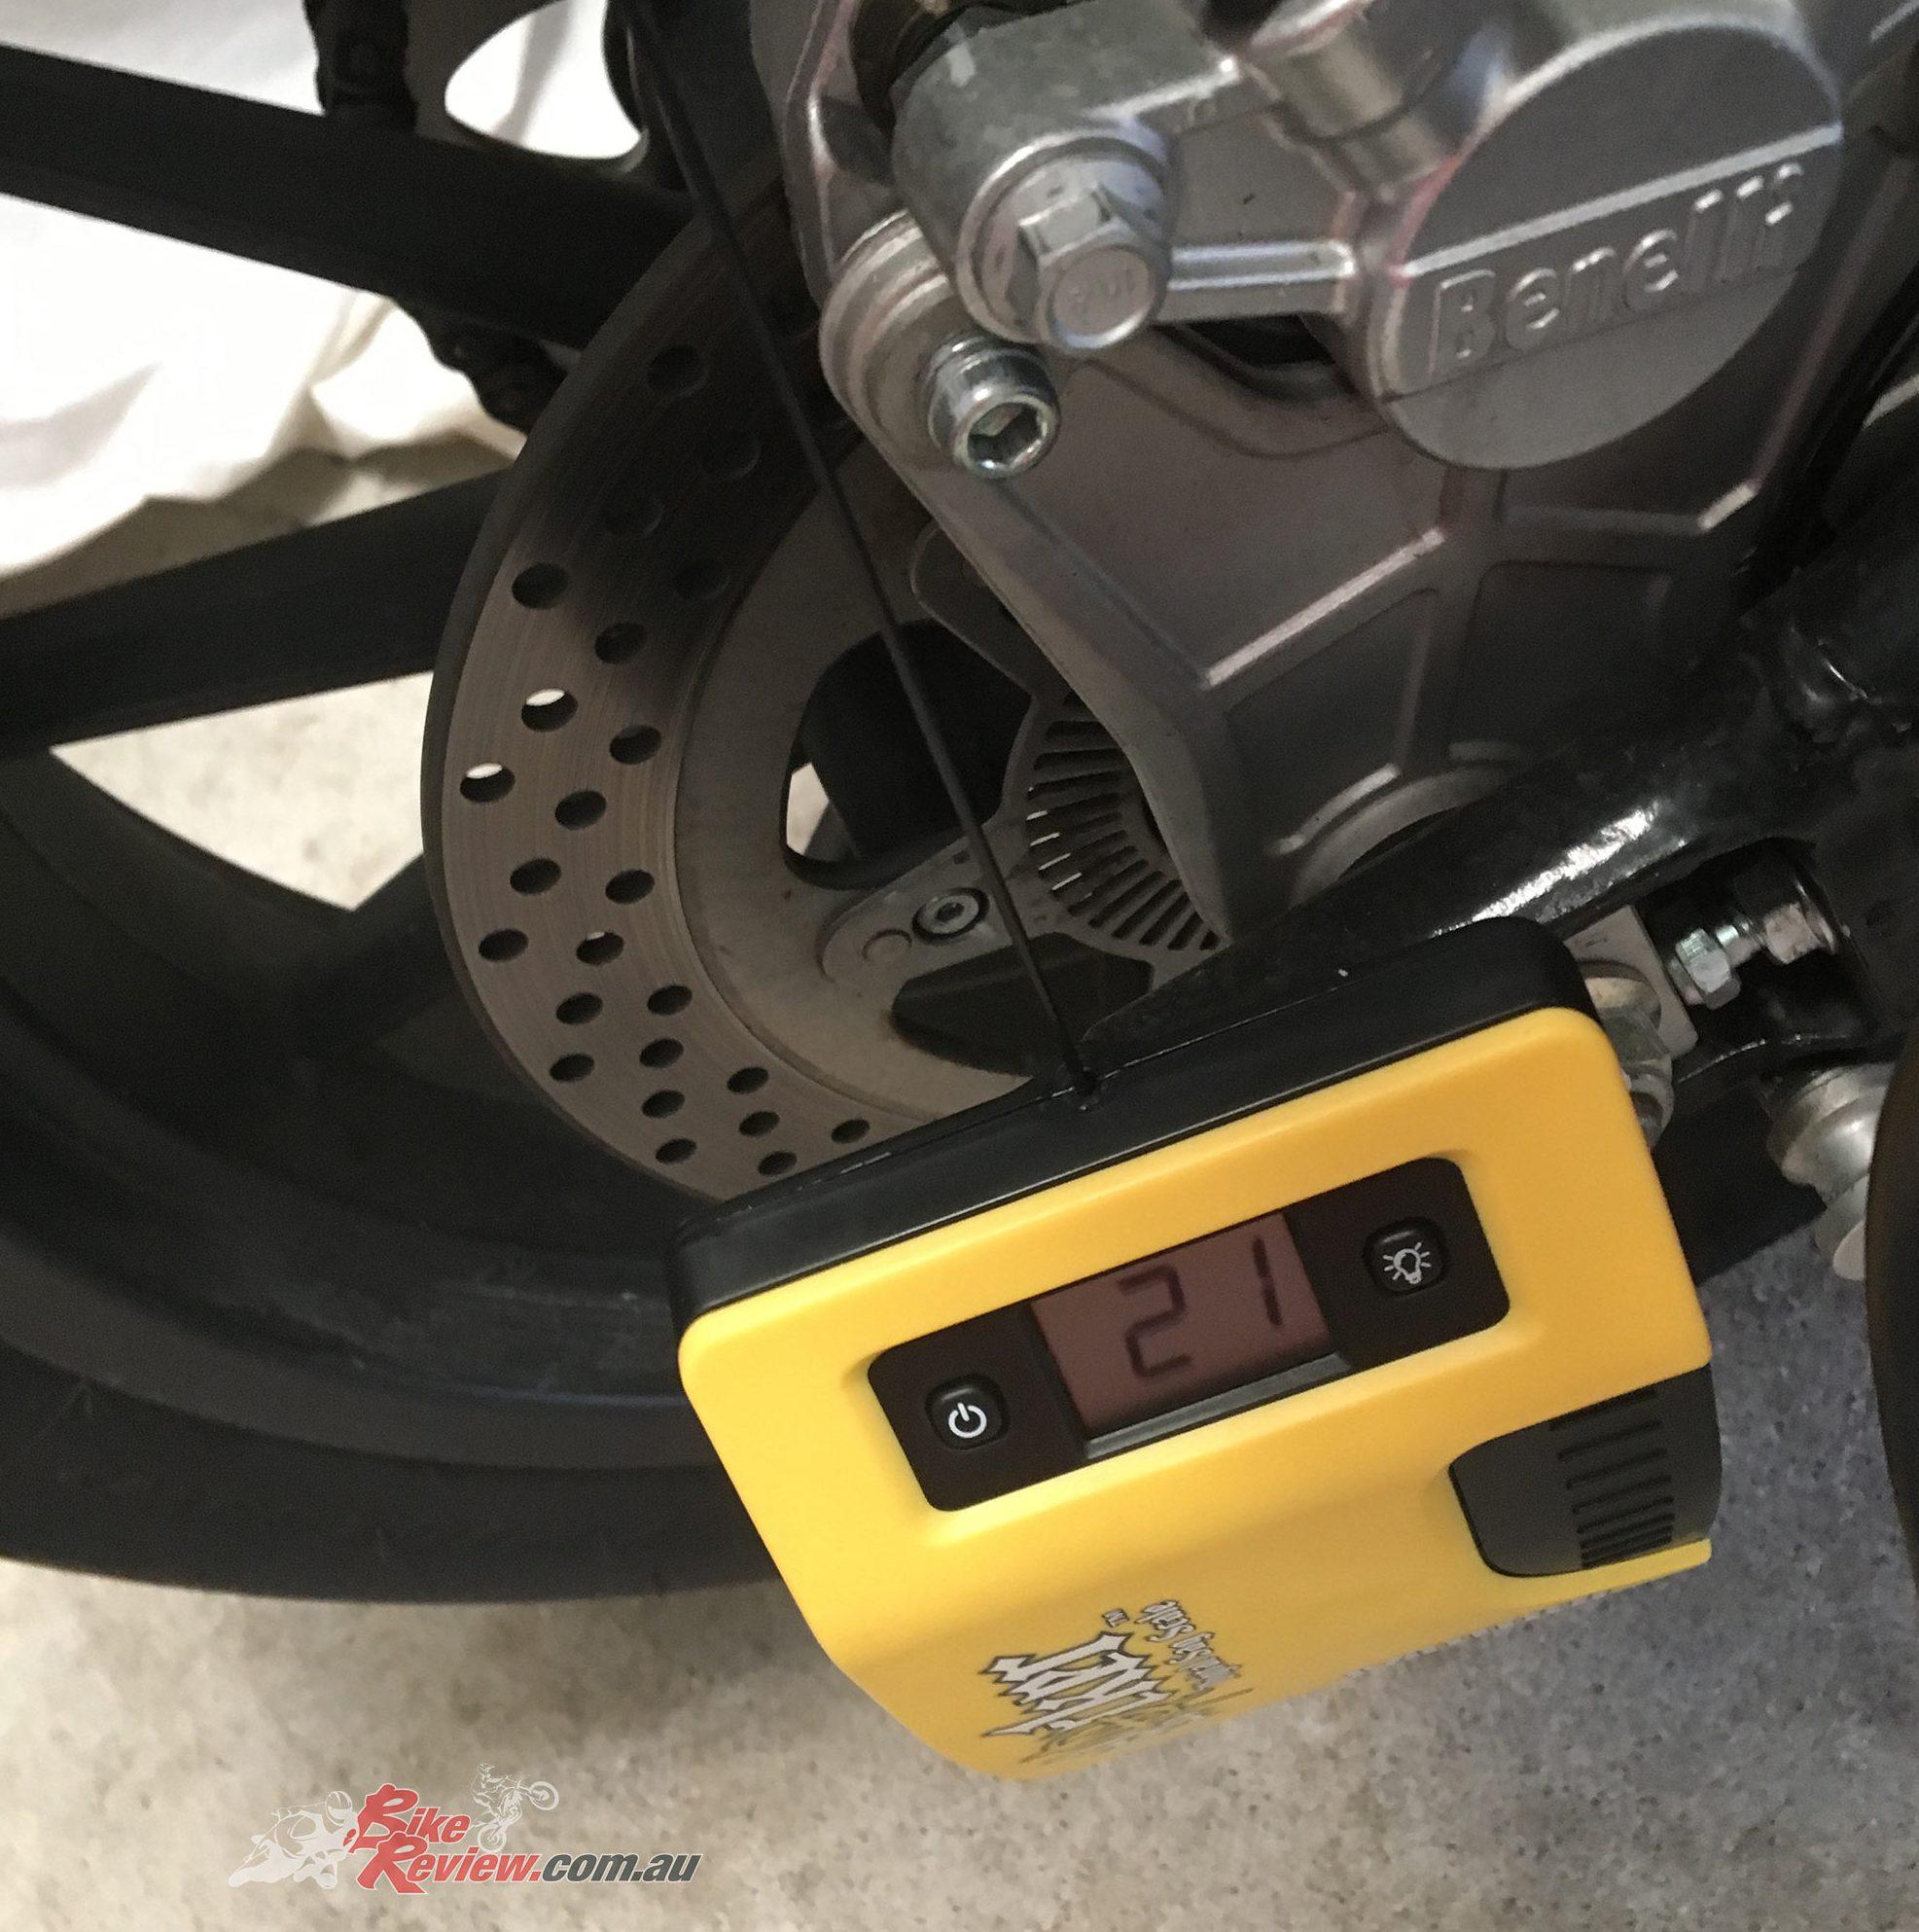 Motool Slacker BikeReview17